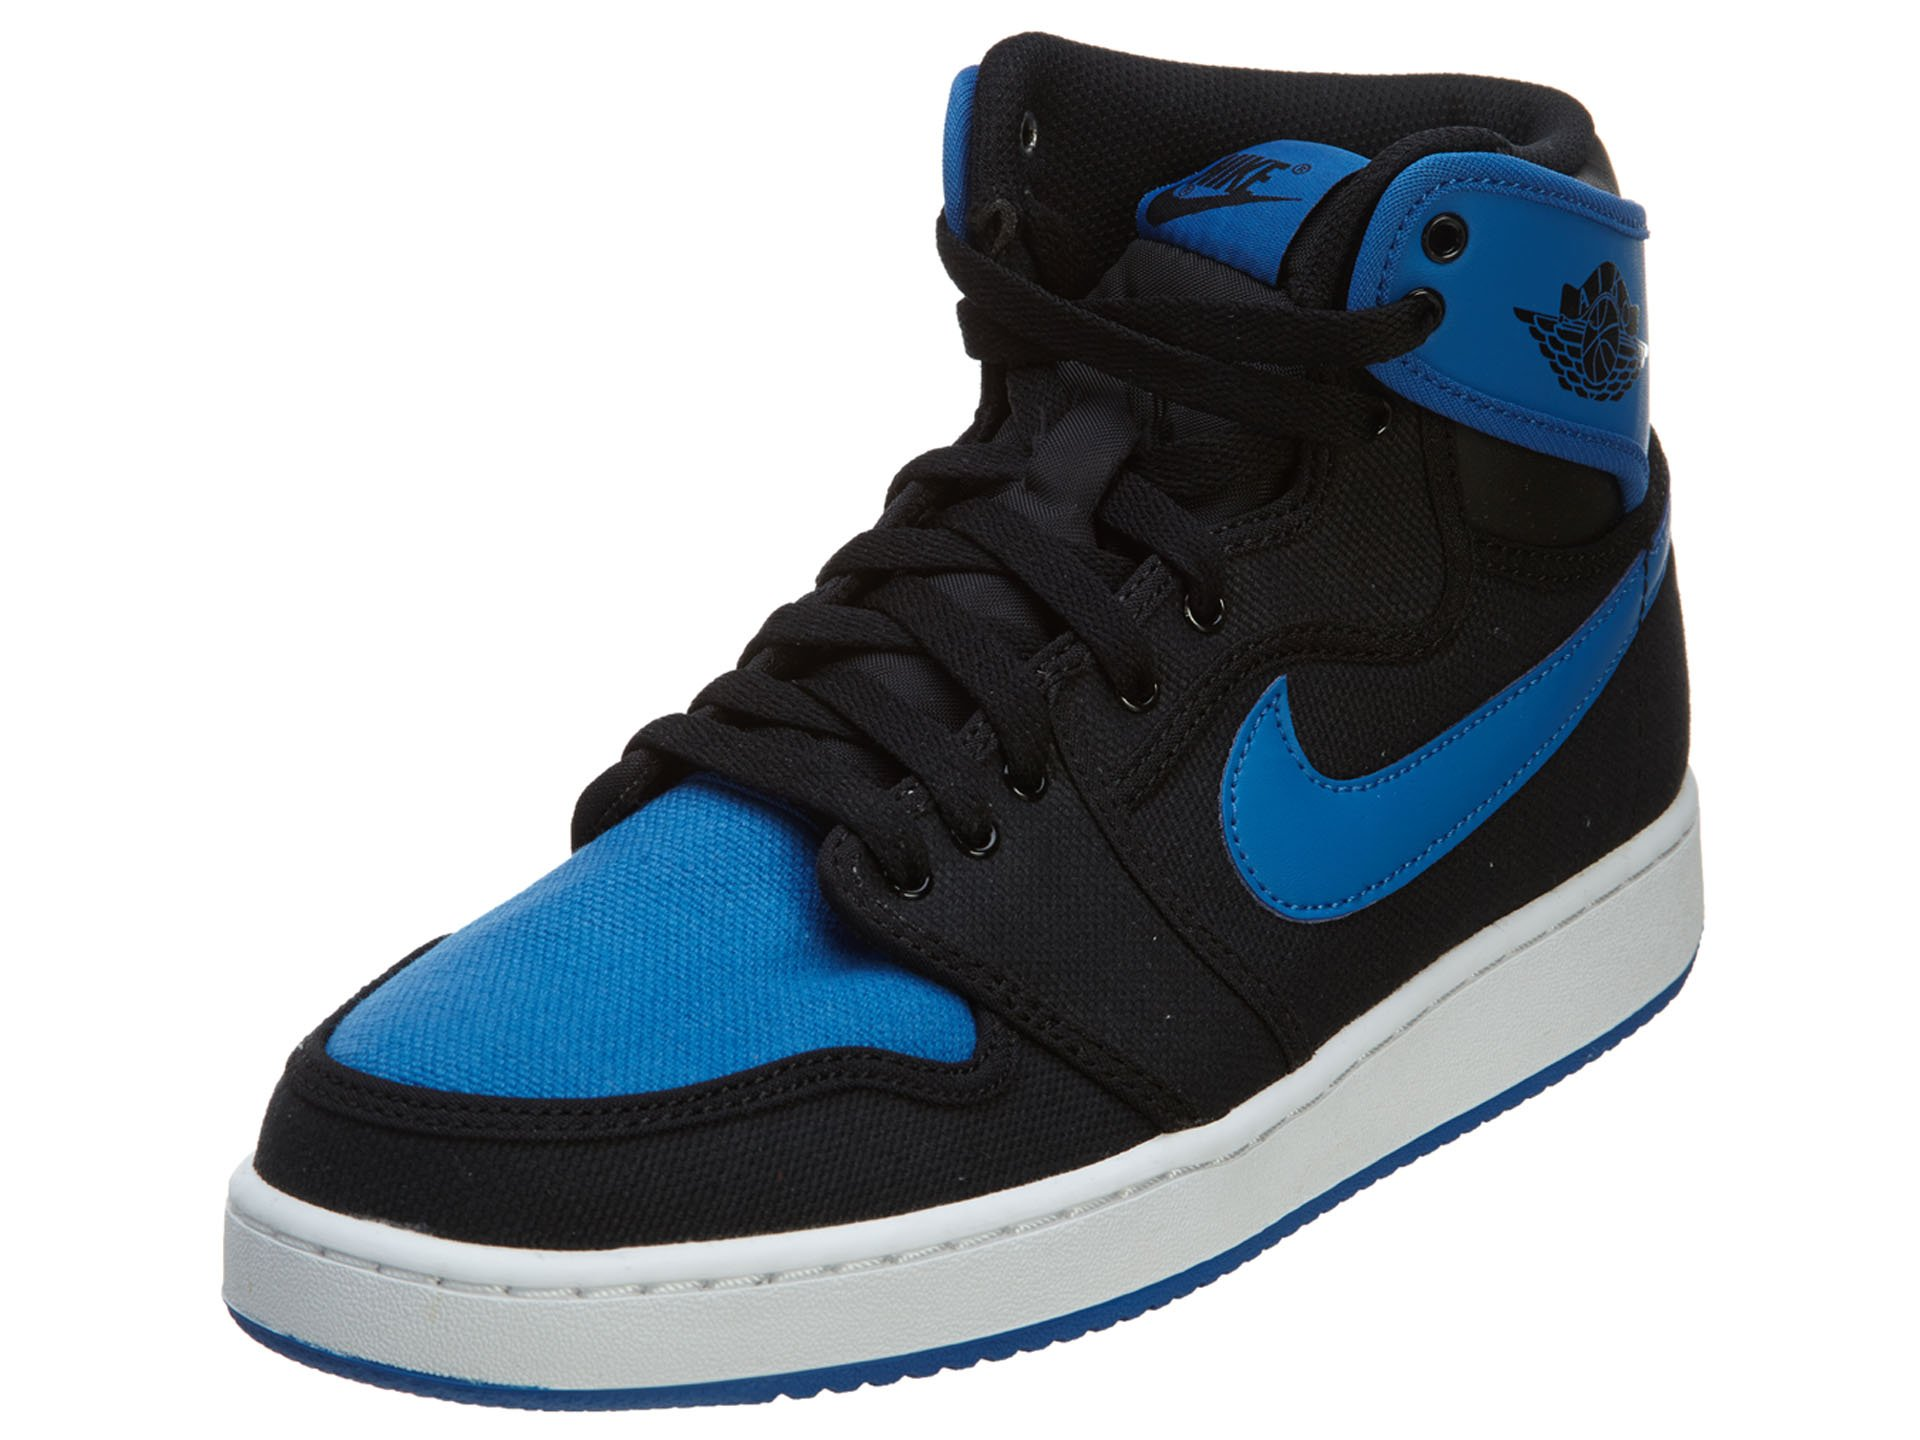 Nike Air Jordan 1 KO High OG Men's Shoes Black/Sport Blue 638471-007